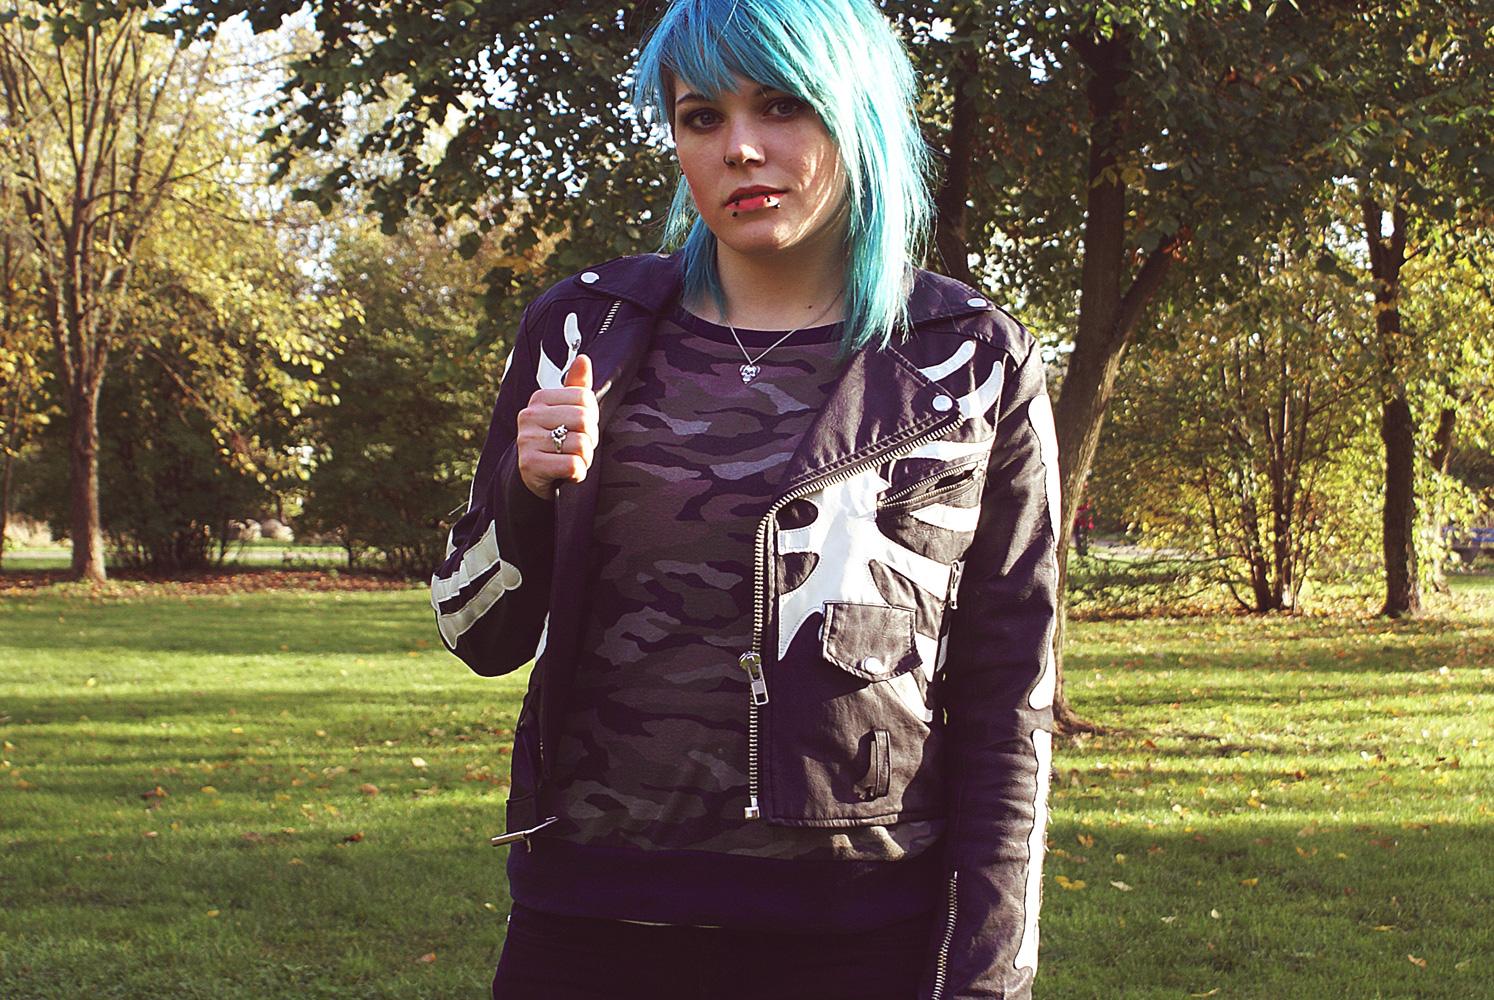 unif boneyard moto jacket jacke knochen camo camouflage gina tricot tripp nyc stud jean jeans punk outfit alternative mode